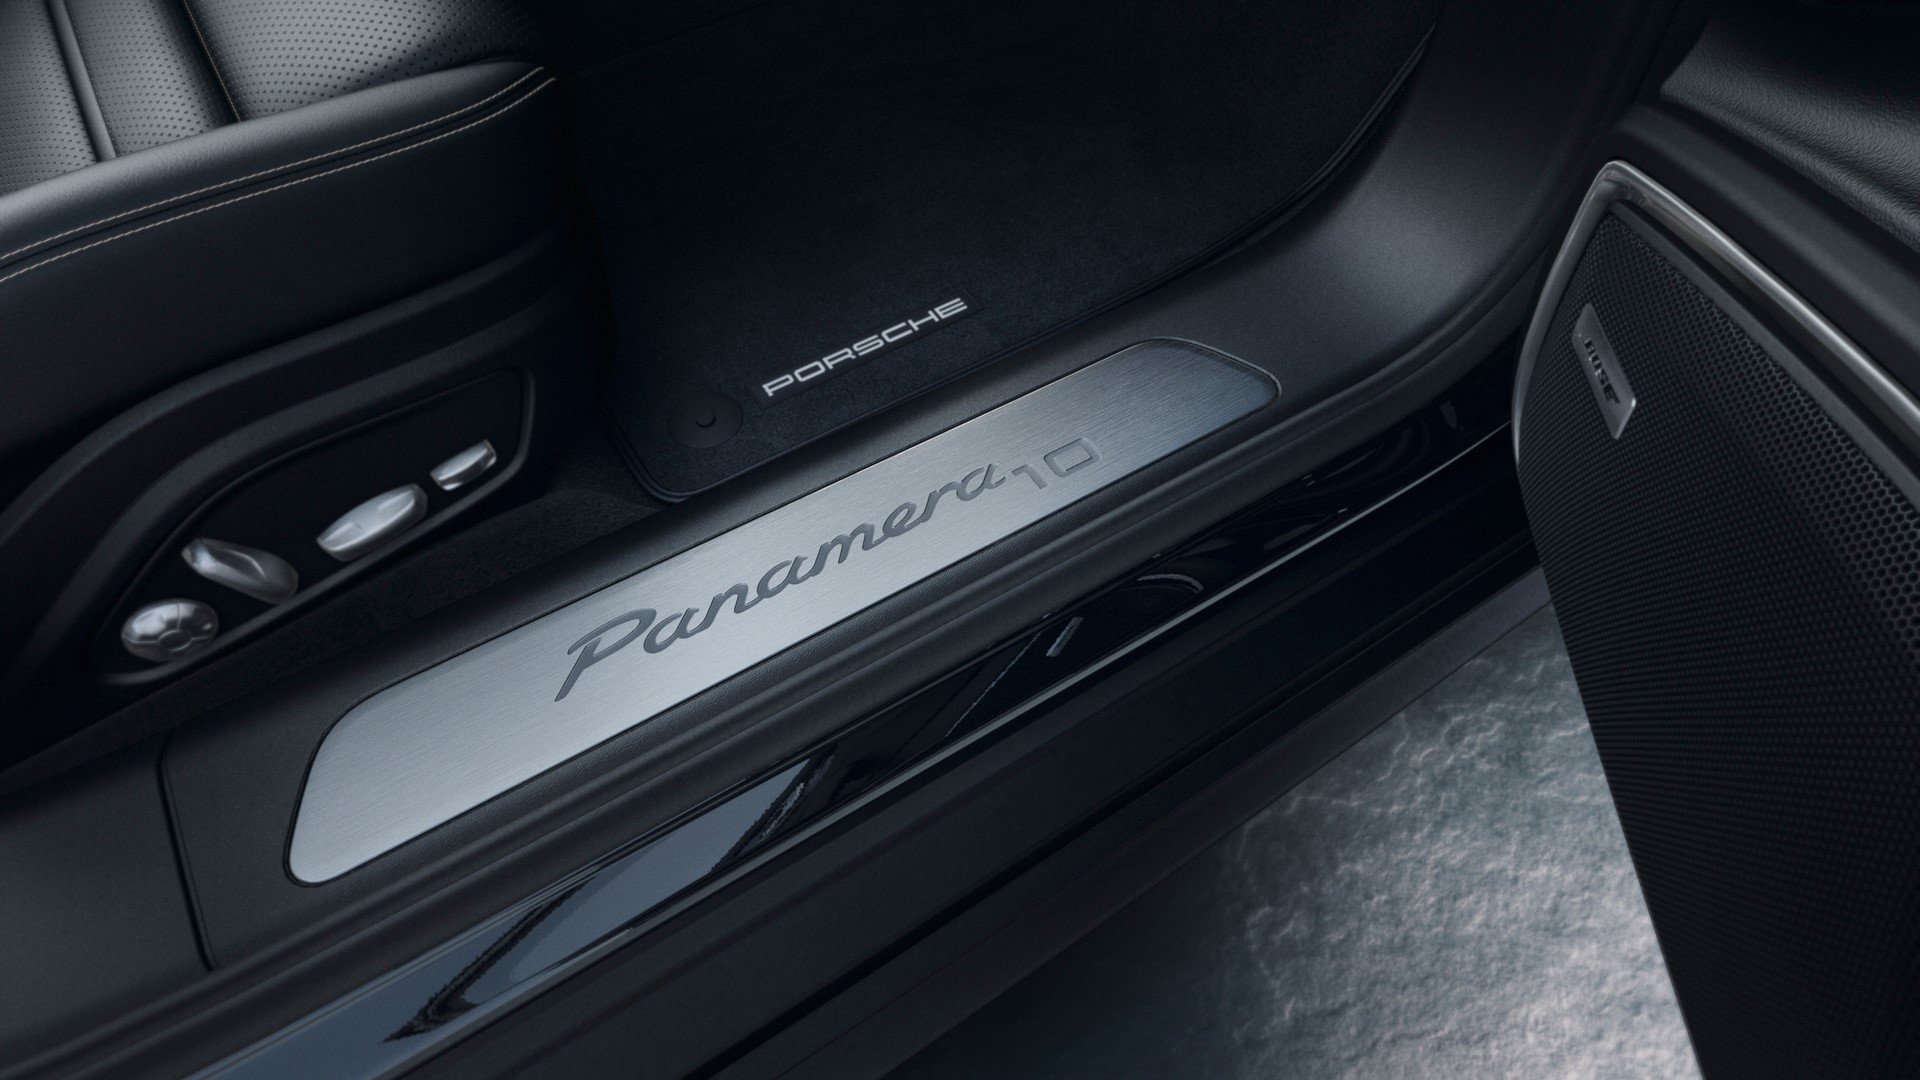 Porsche-Panamera-10-Years-Edition-10